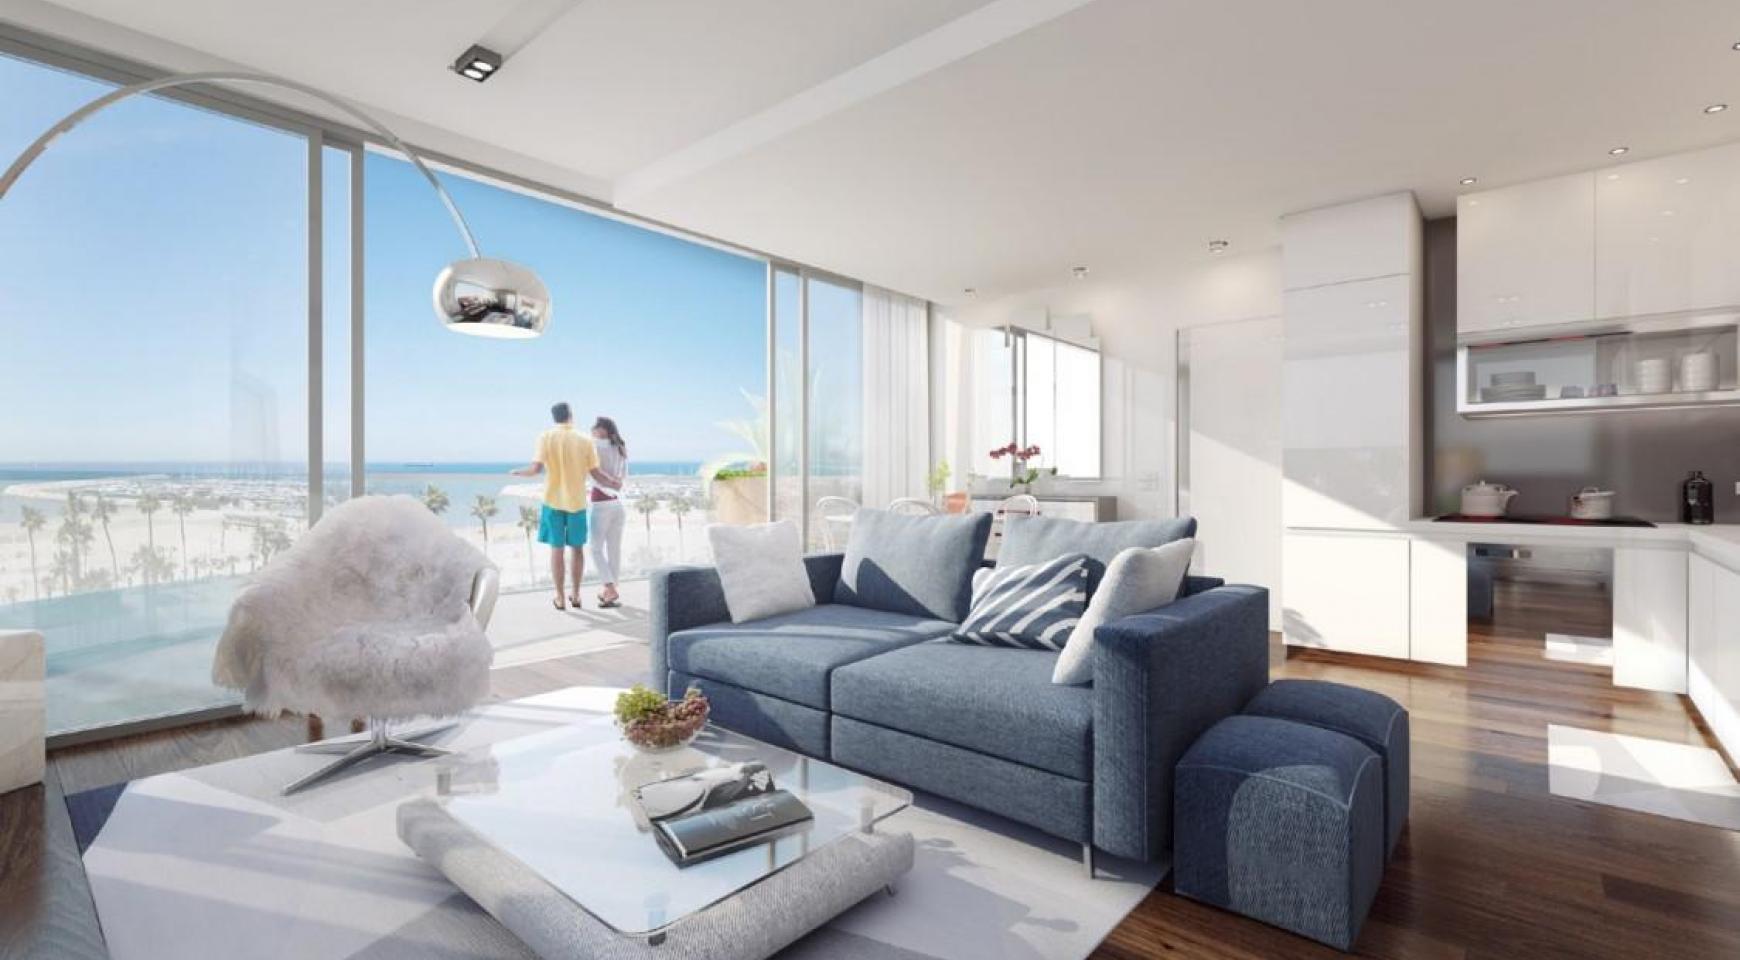 New 2 Bedroom Apartment near the Sea - 7